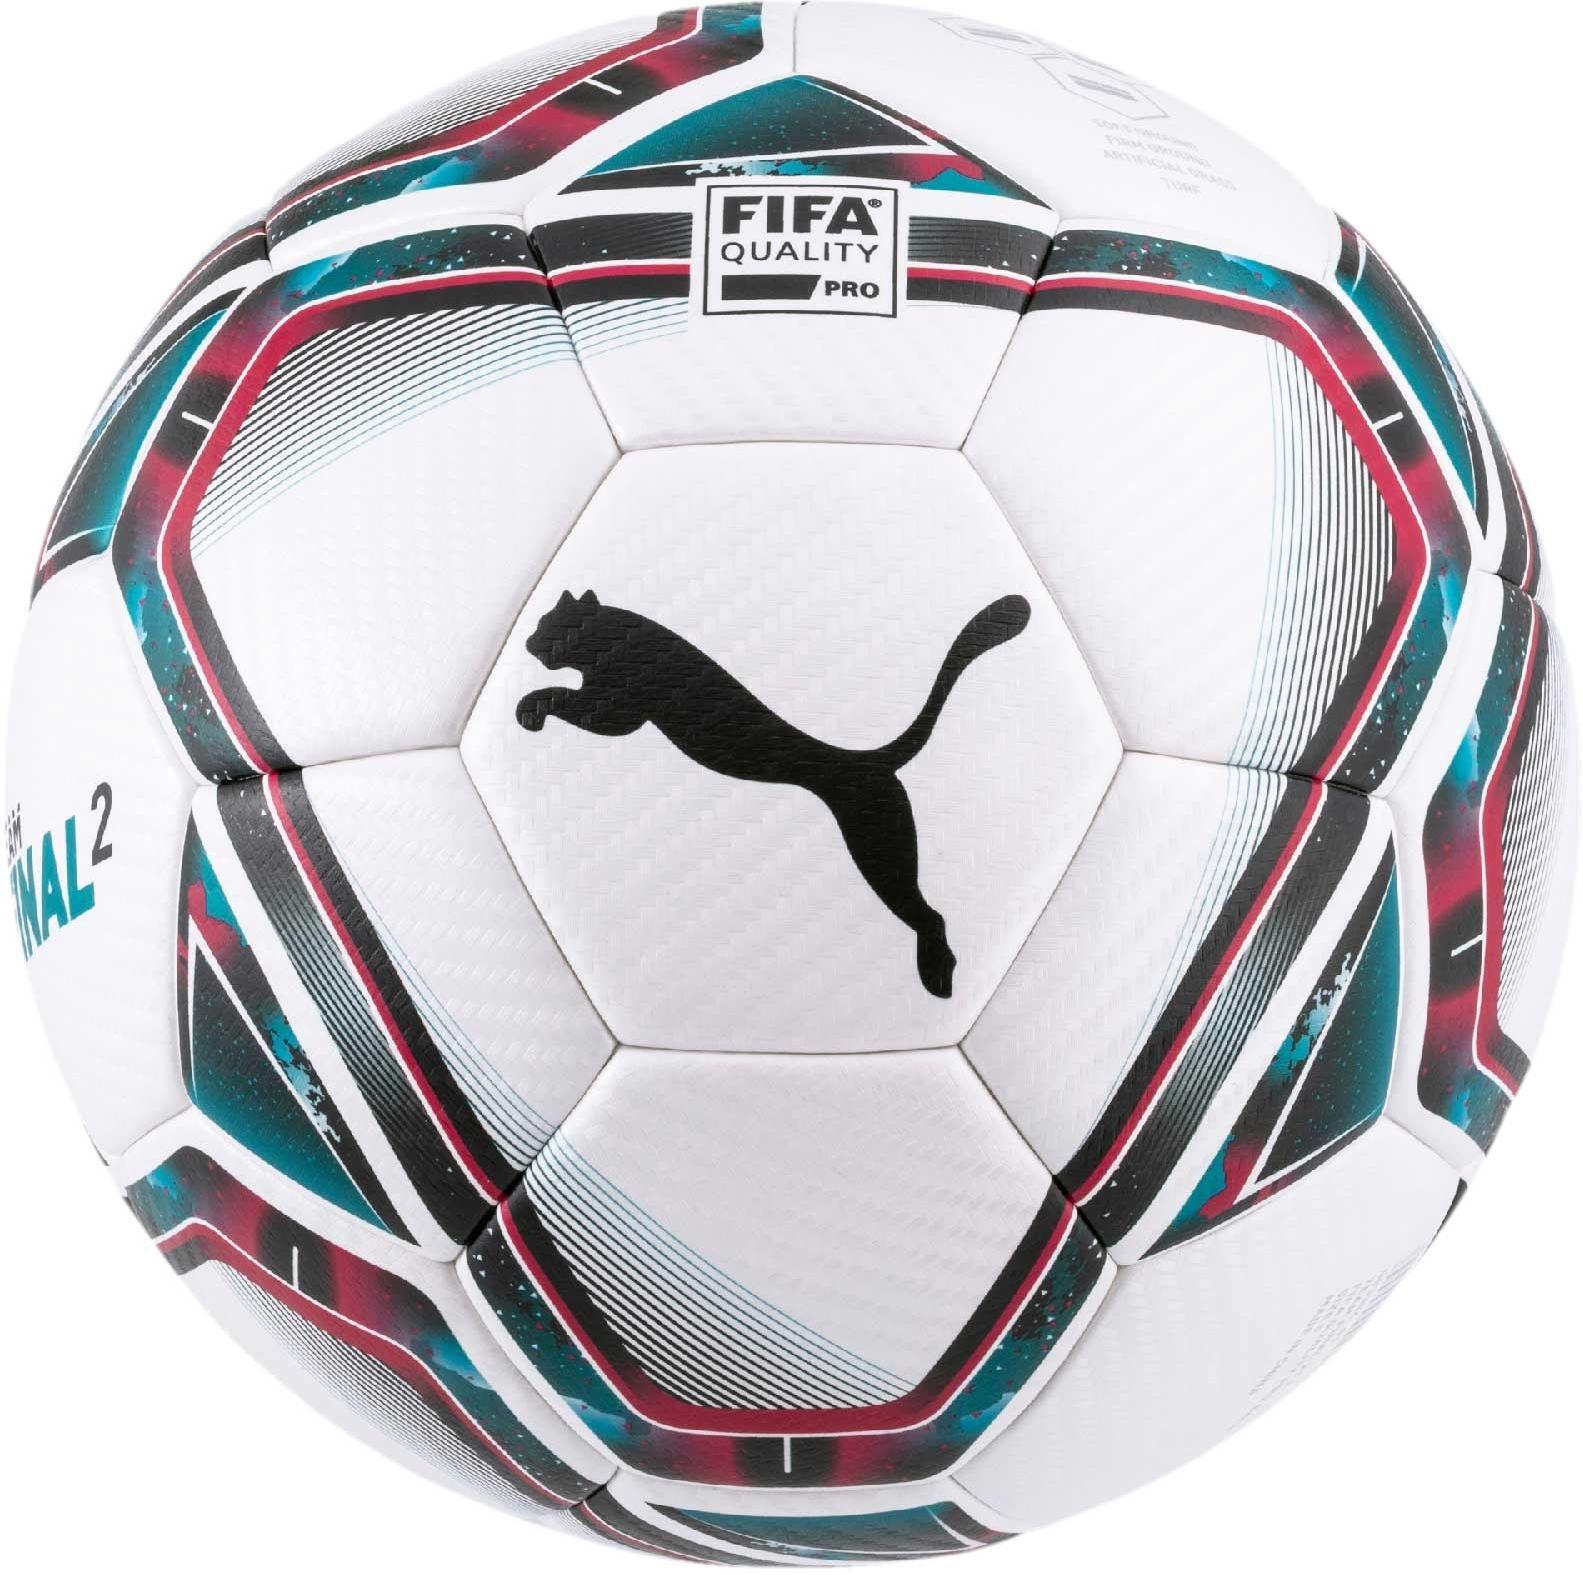 Puma teamFINAL 21.2 FIFA Quality Pro Labda